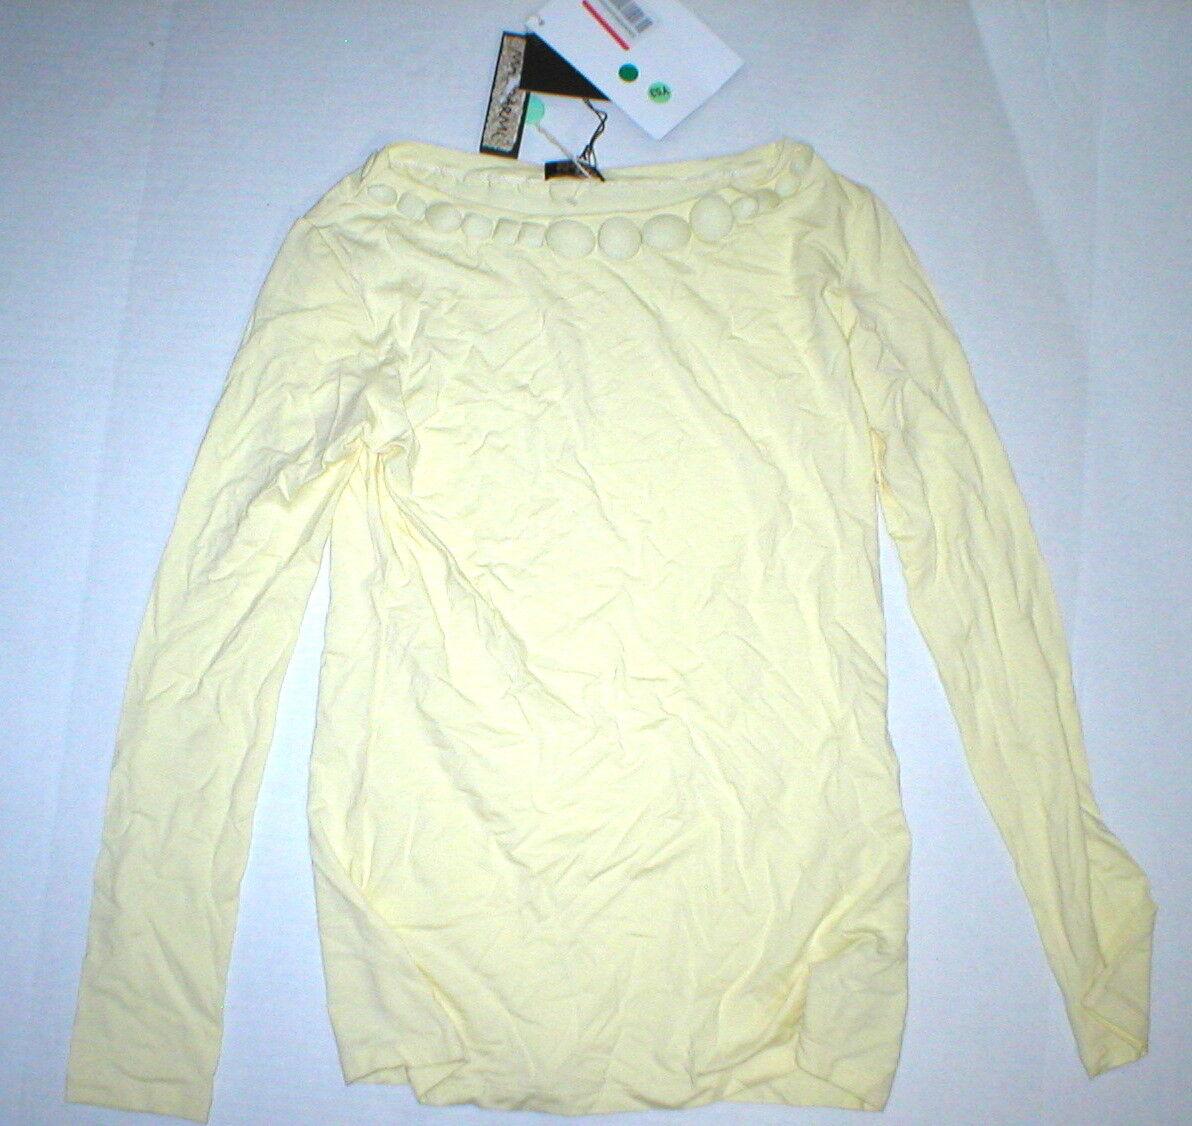 NWT New damen Maliparmi Knit Top Gelb XS Pale Neck Stone Accents LS Designer